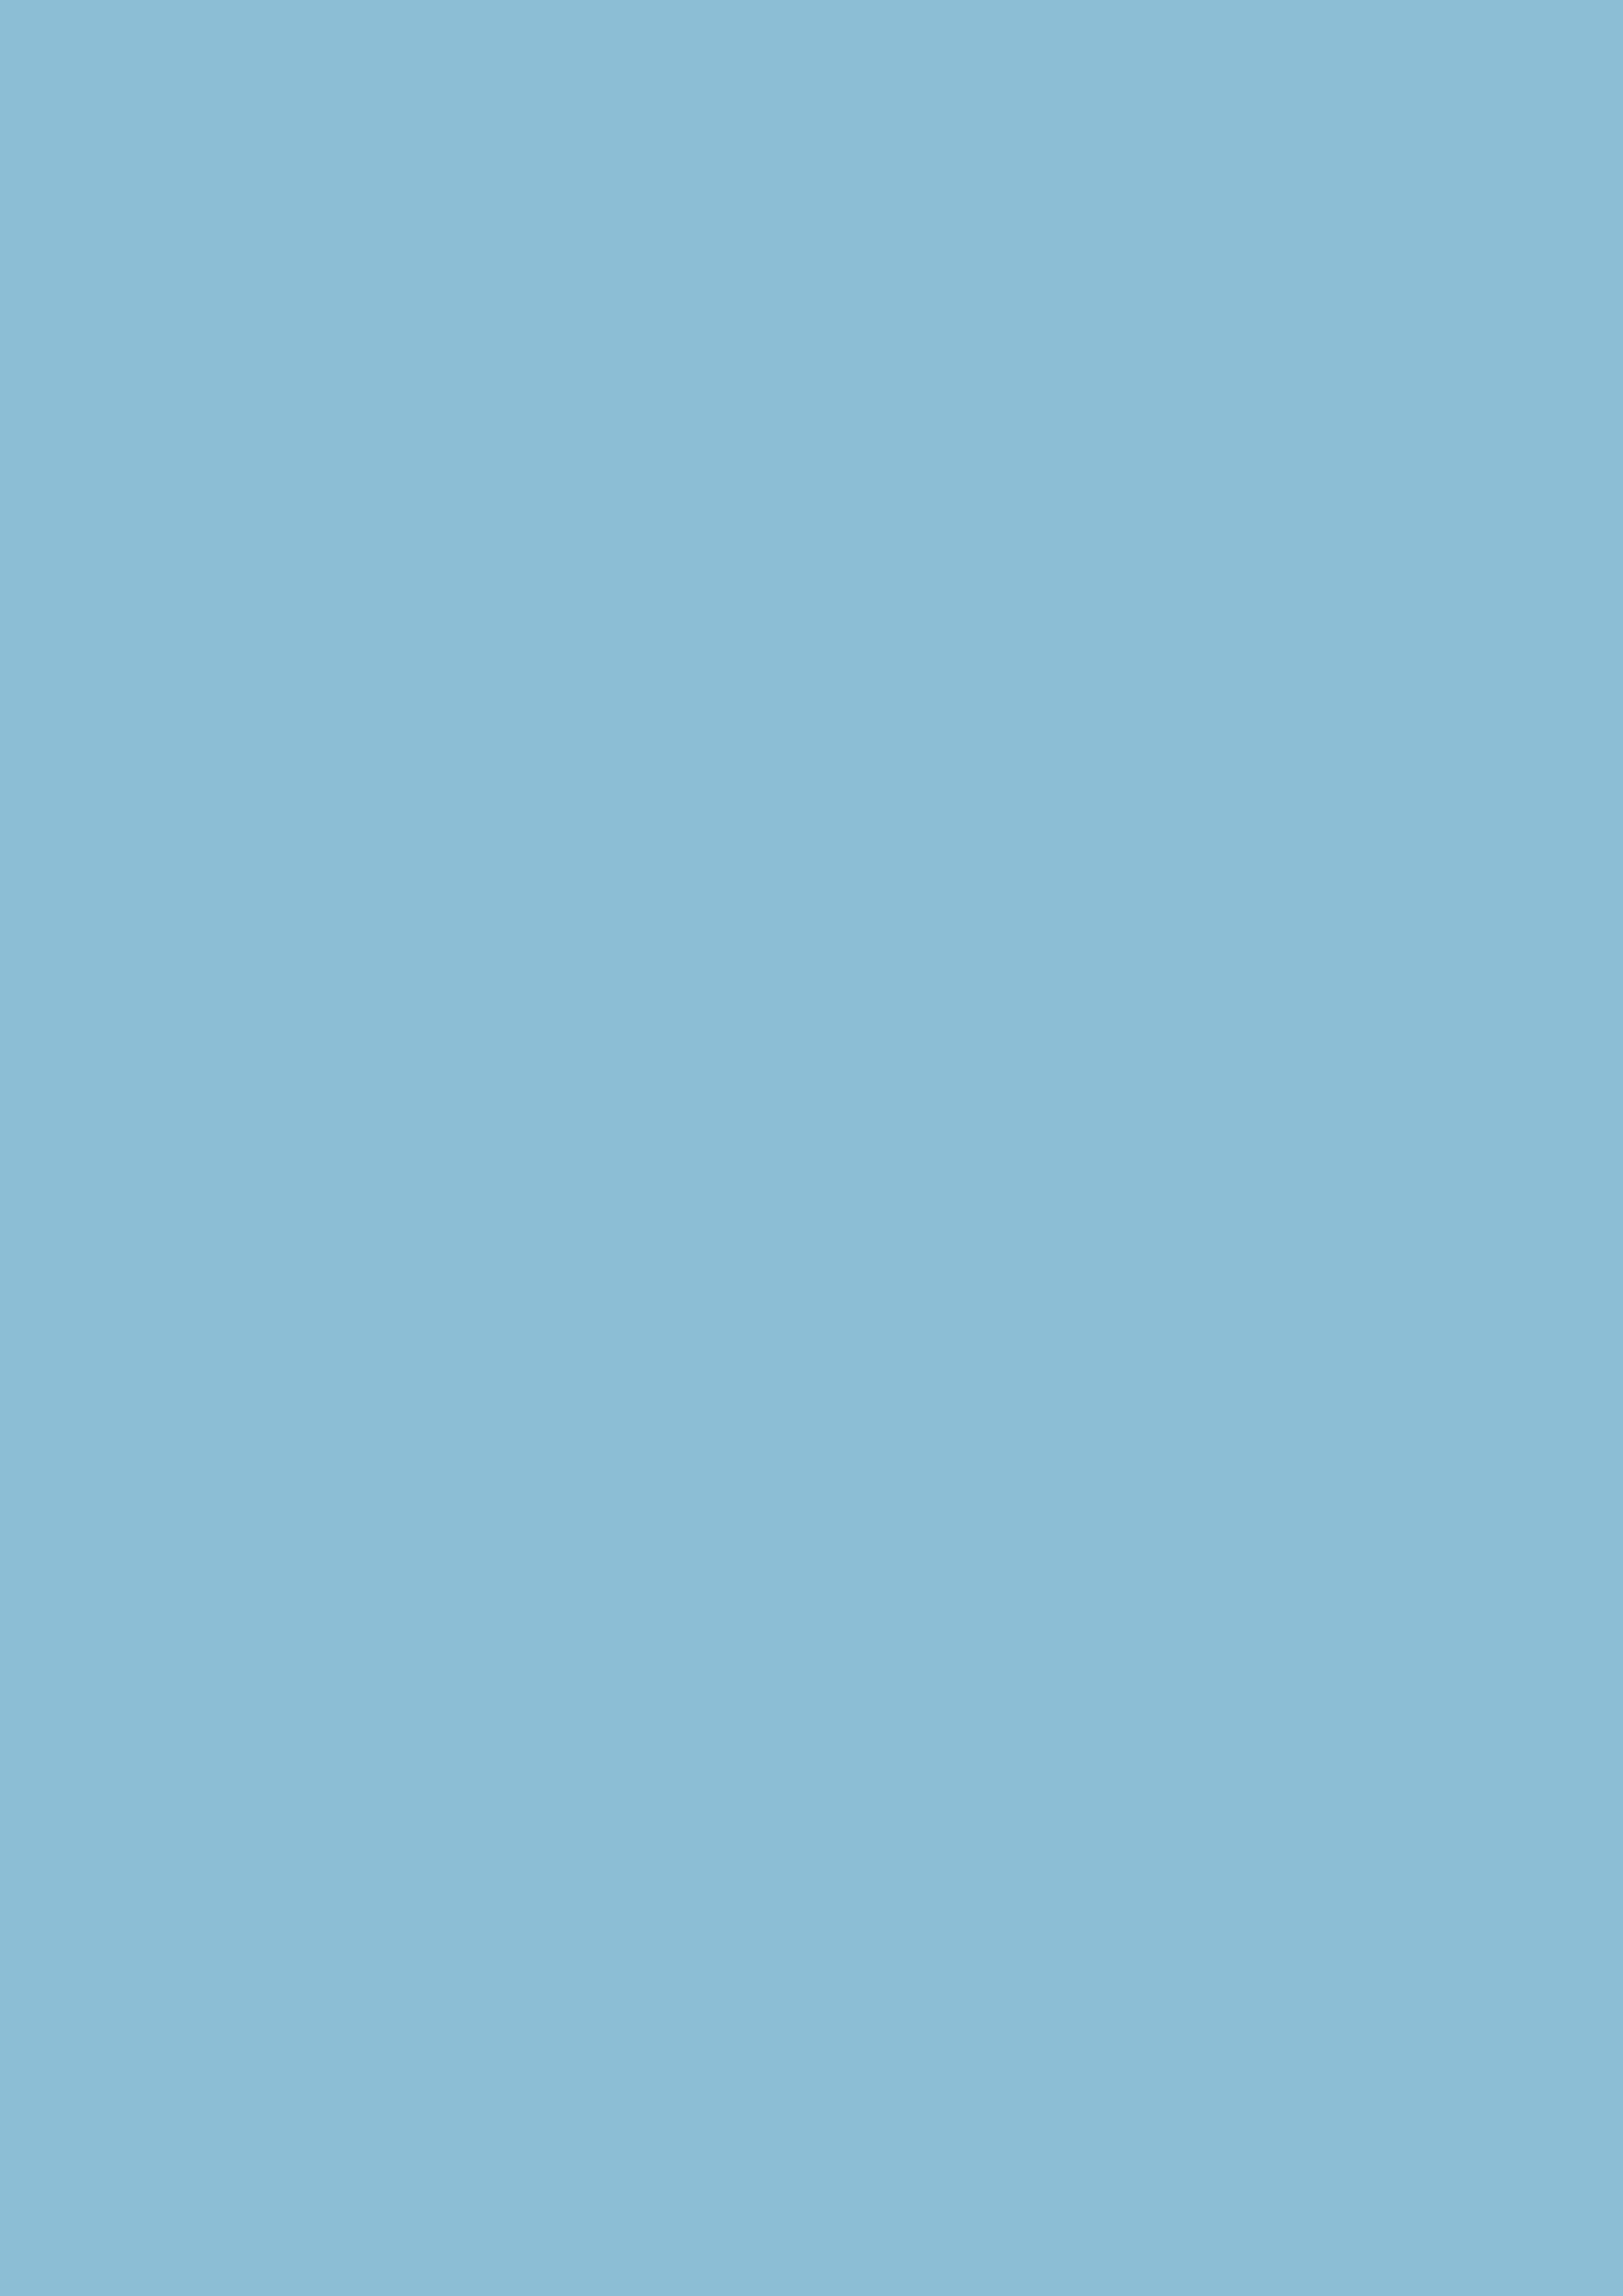 2480x3508 Dark Sky Blue Solid Color Background